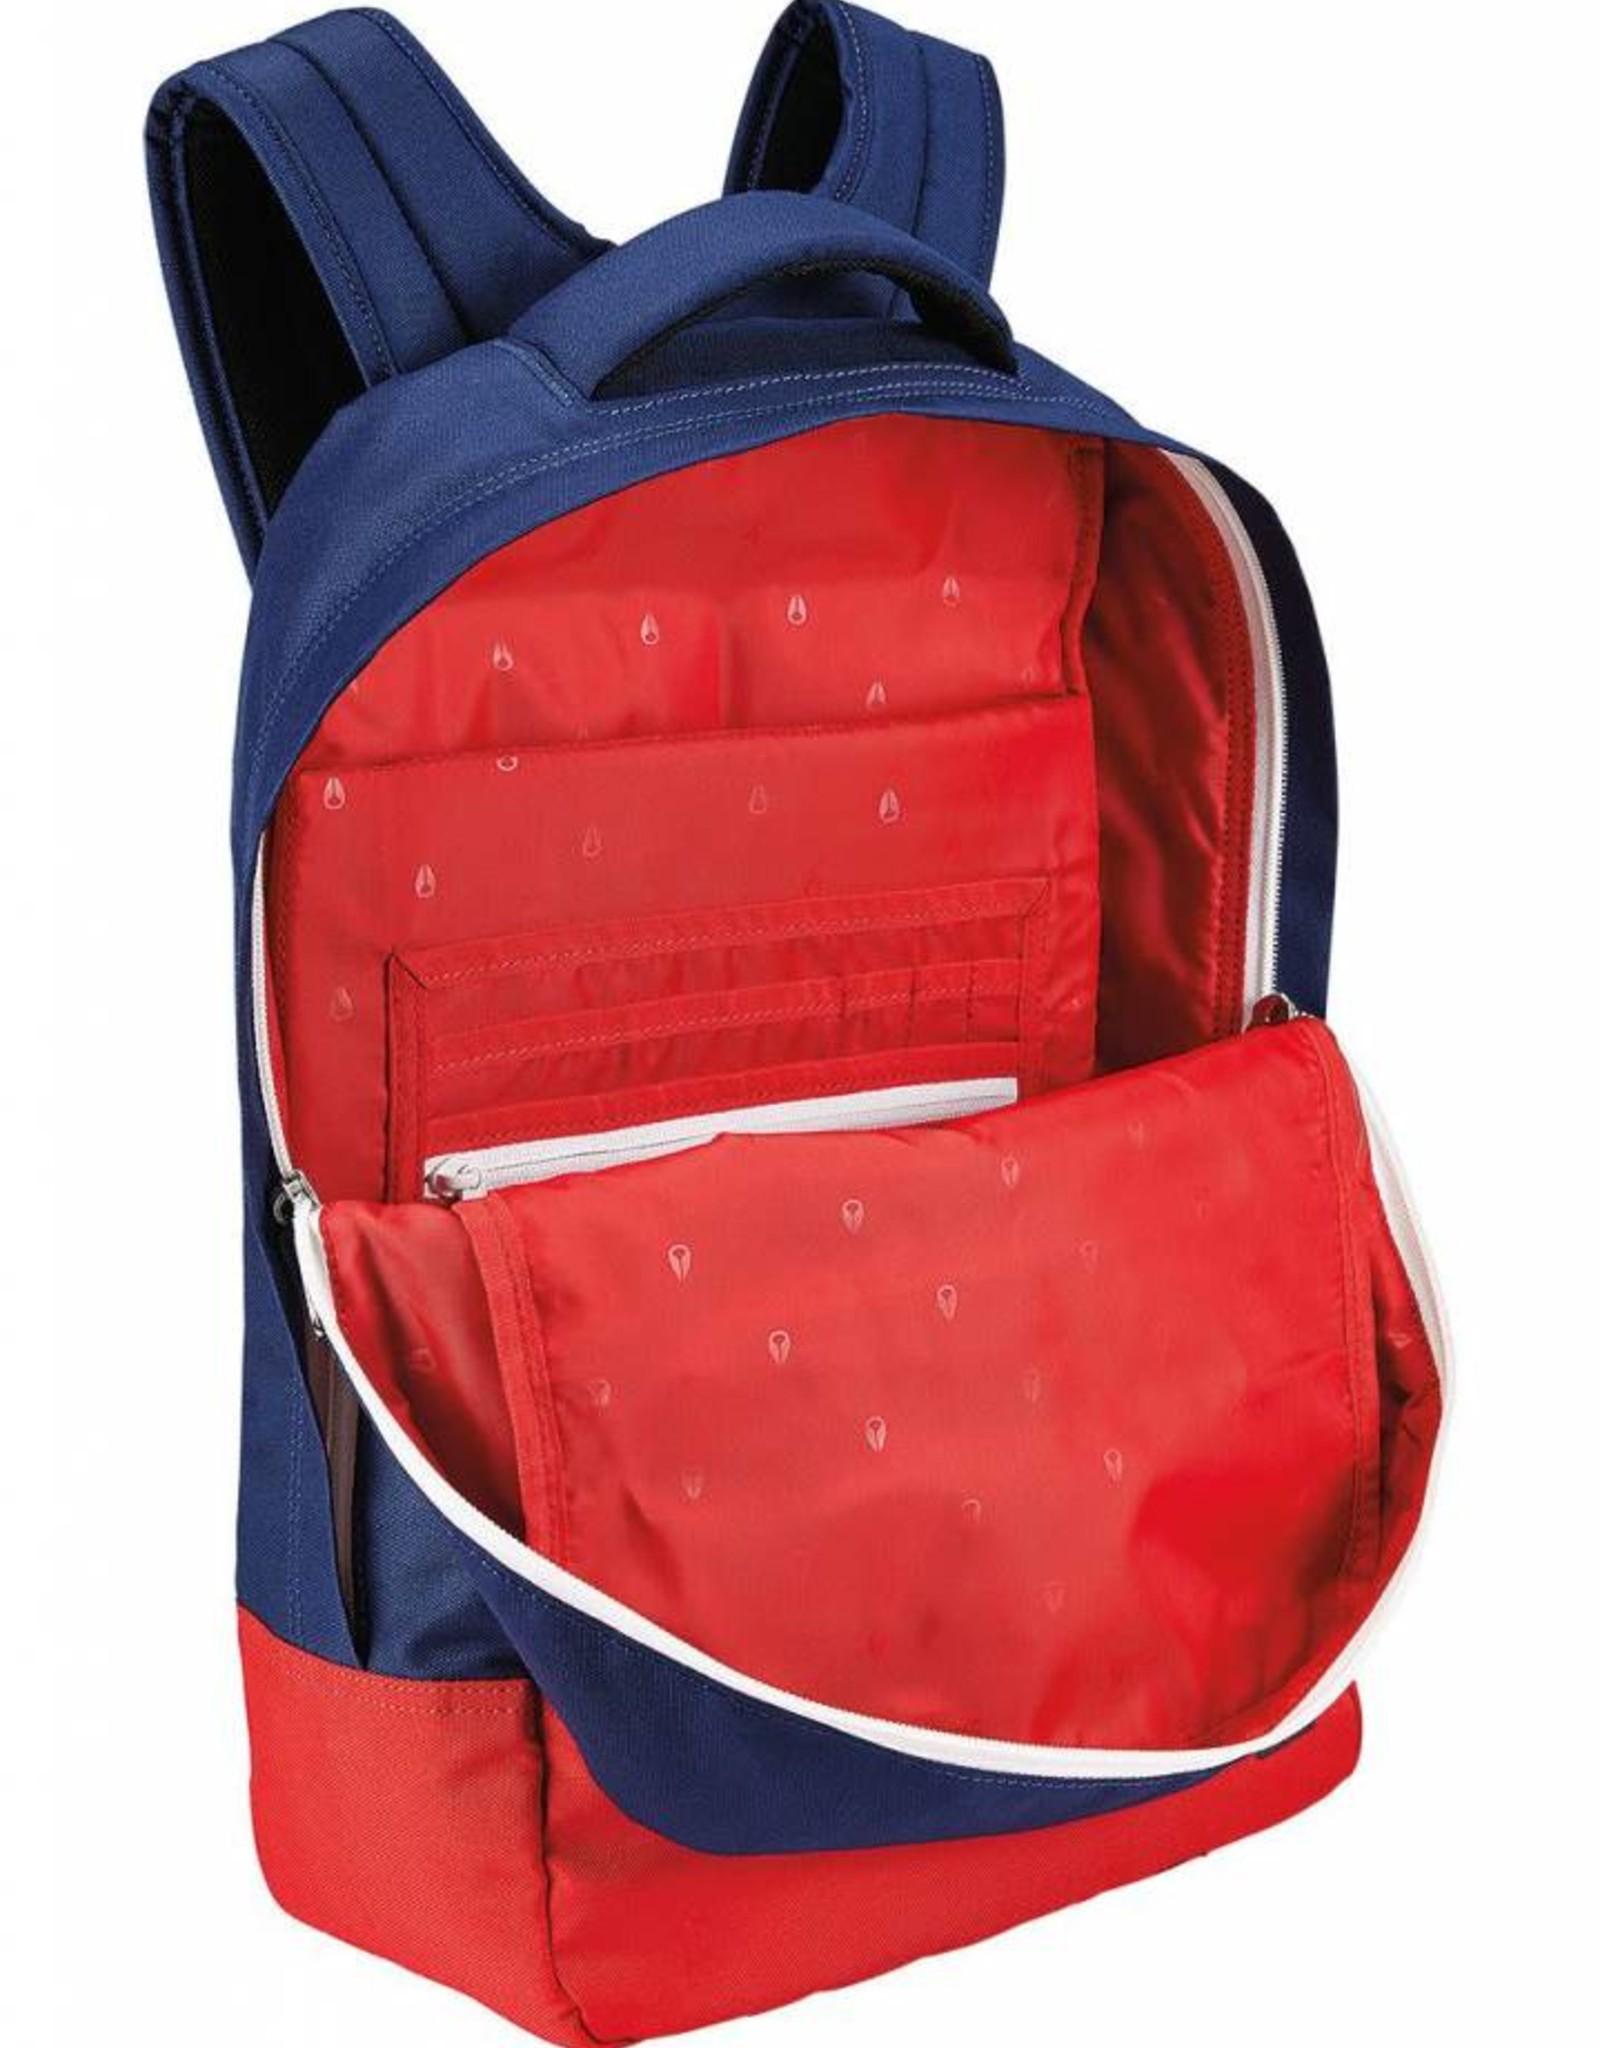 NIXON Beacons BackPack Red/White/Blue